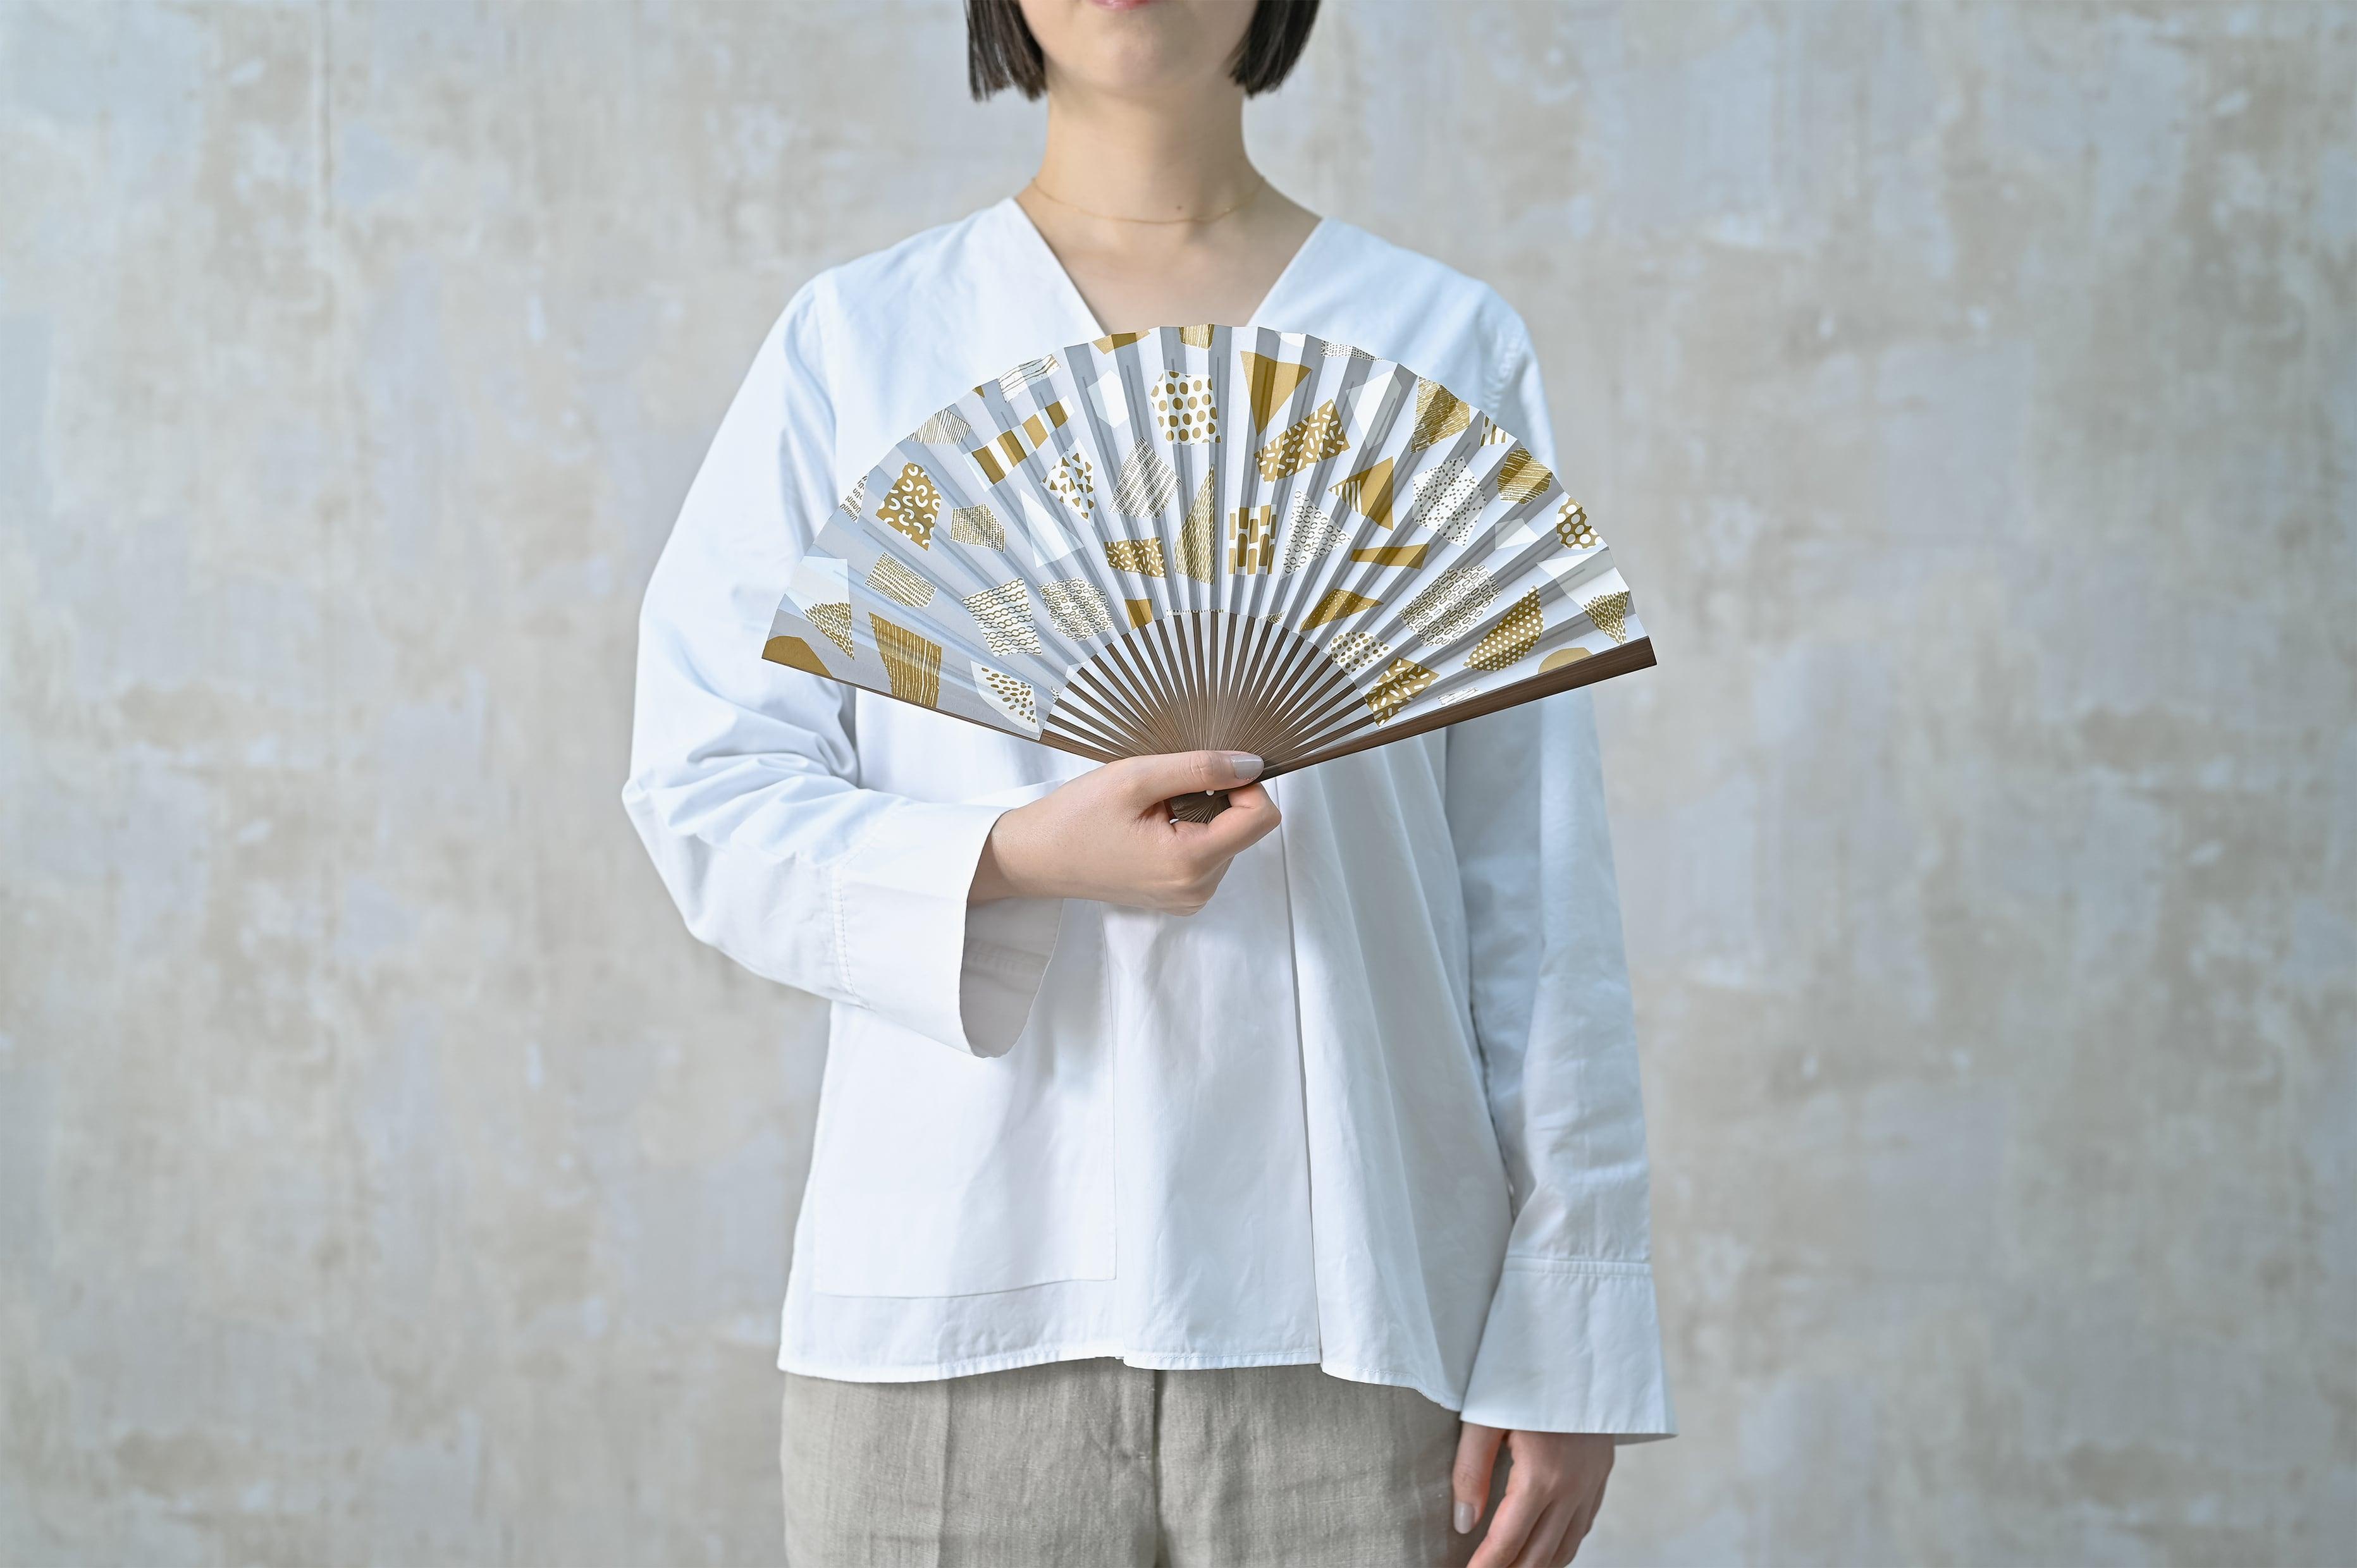 [Men's] UMO#1 山吹茶 Yamabukicha 扇子